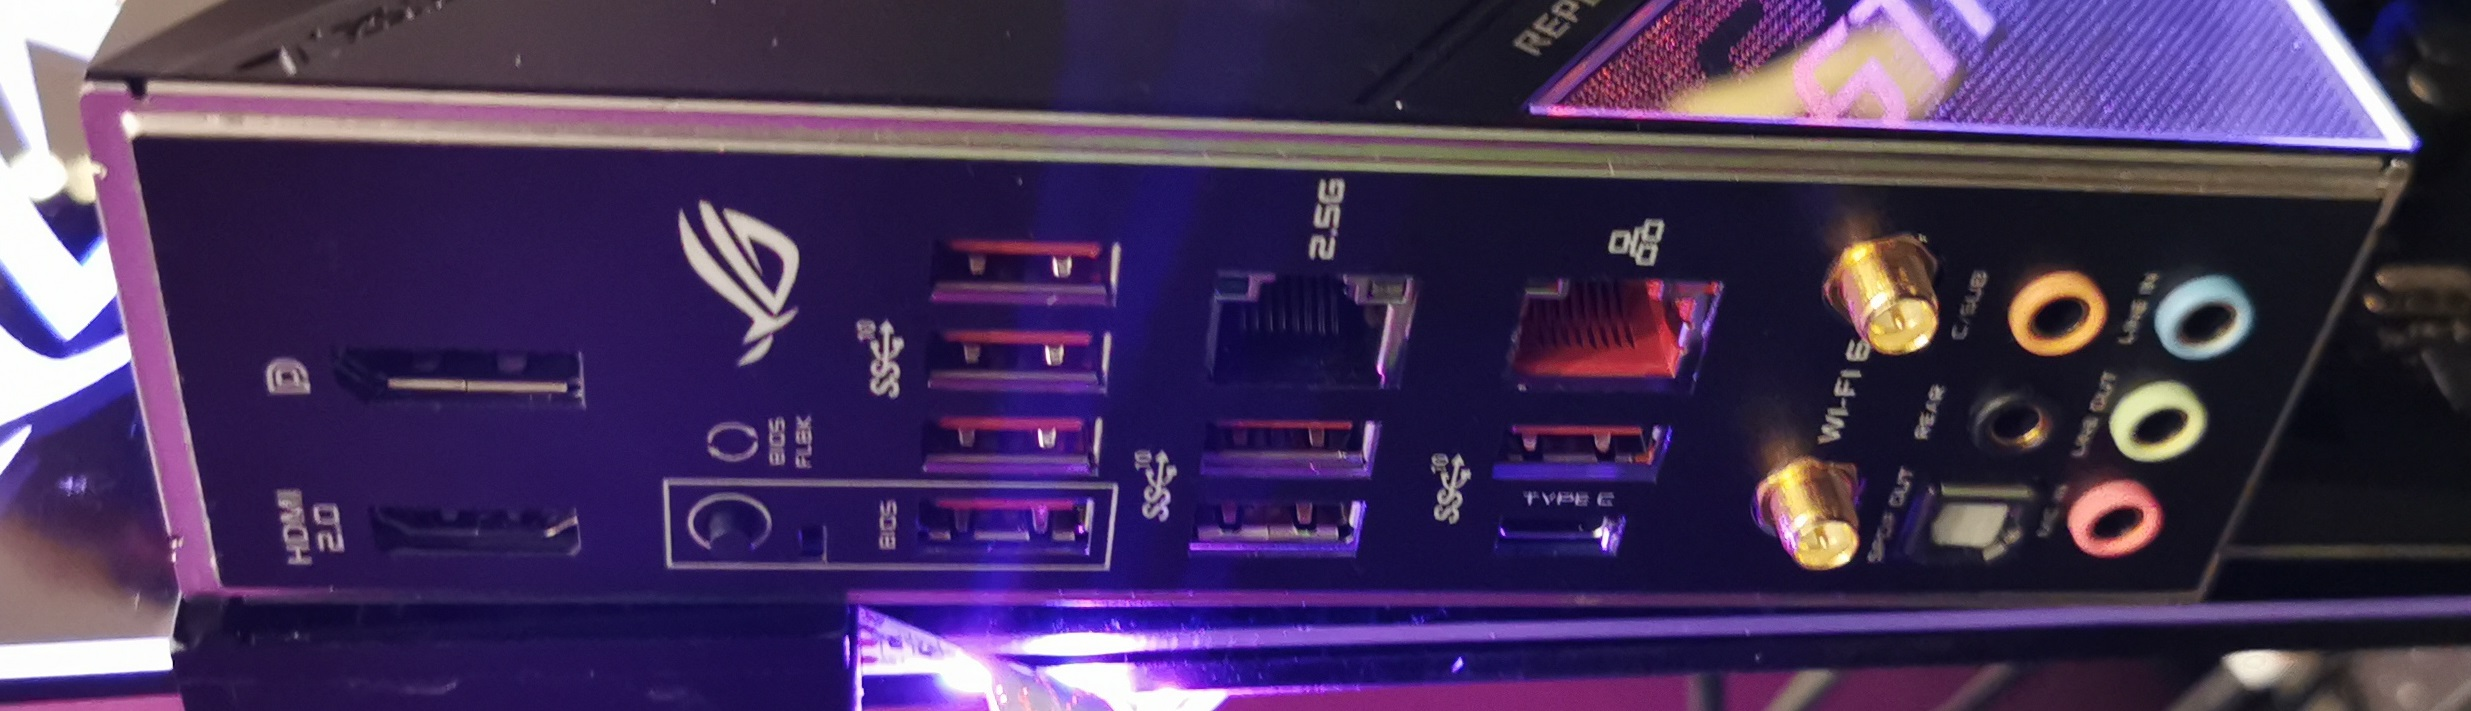 ASUS ROG Strix X570-E and ROG Strix X570-F Gaming